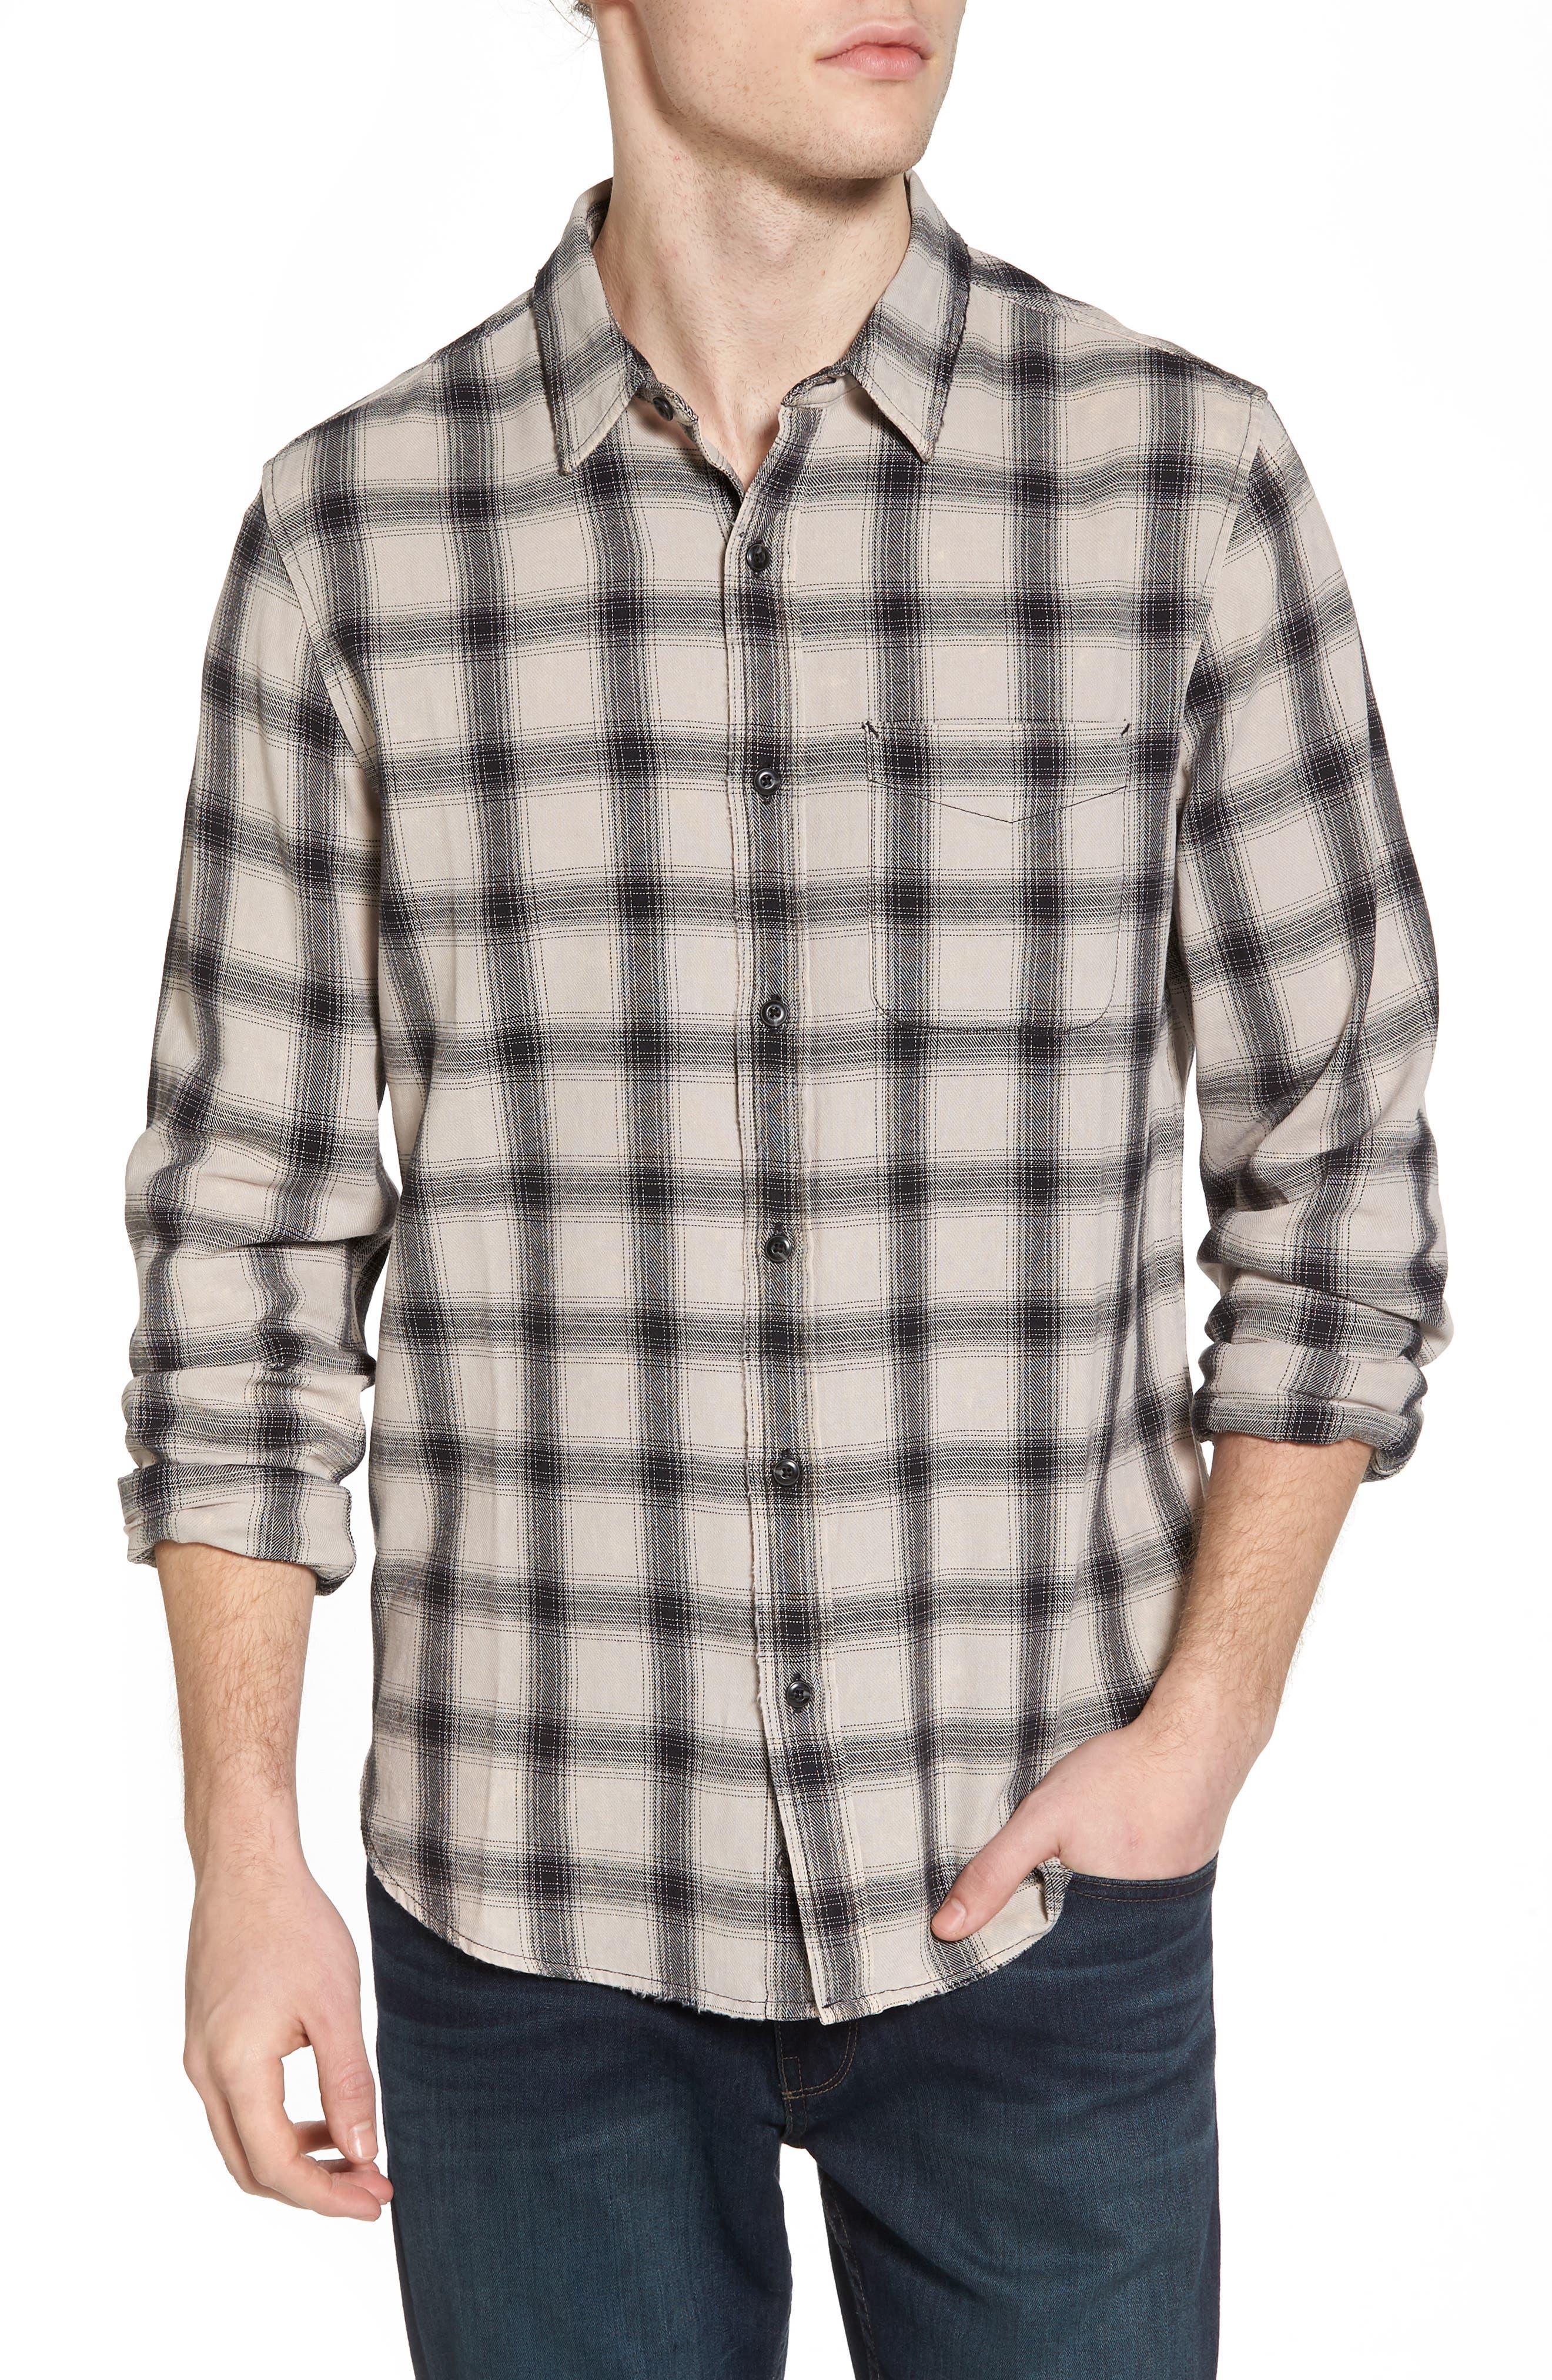 Colton Slim Fit Plaid Sport Shirt,                             Main thumbnail 1, color,                             15 Years Mineral Veil/ Black